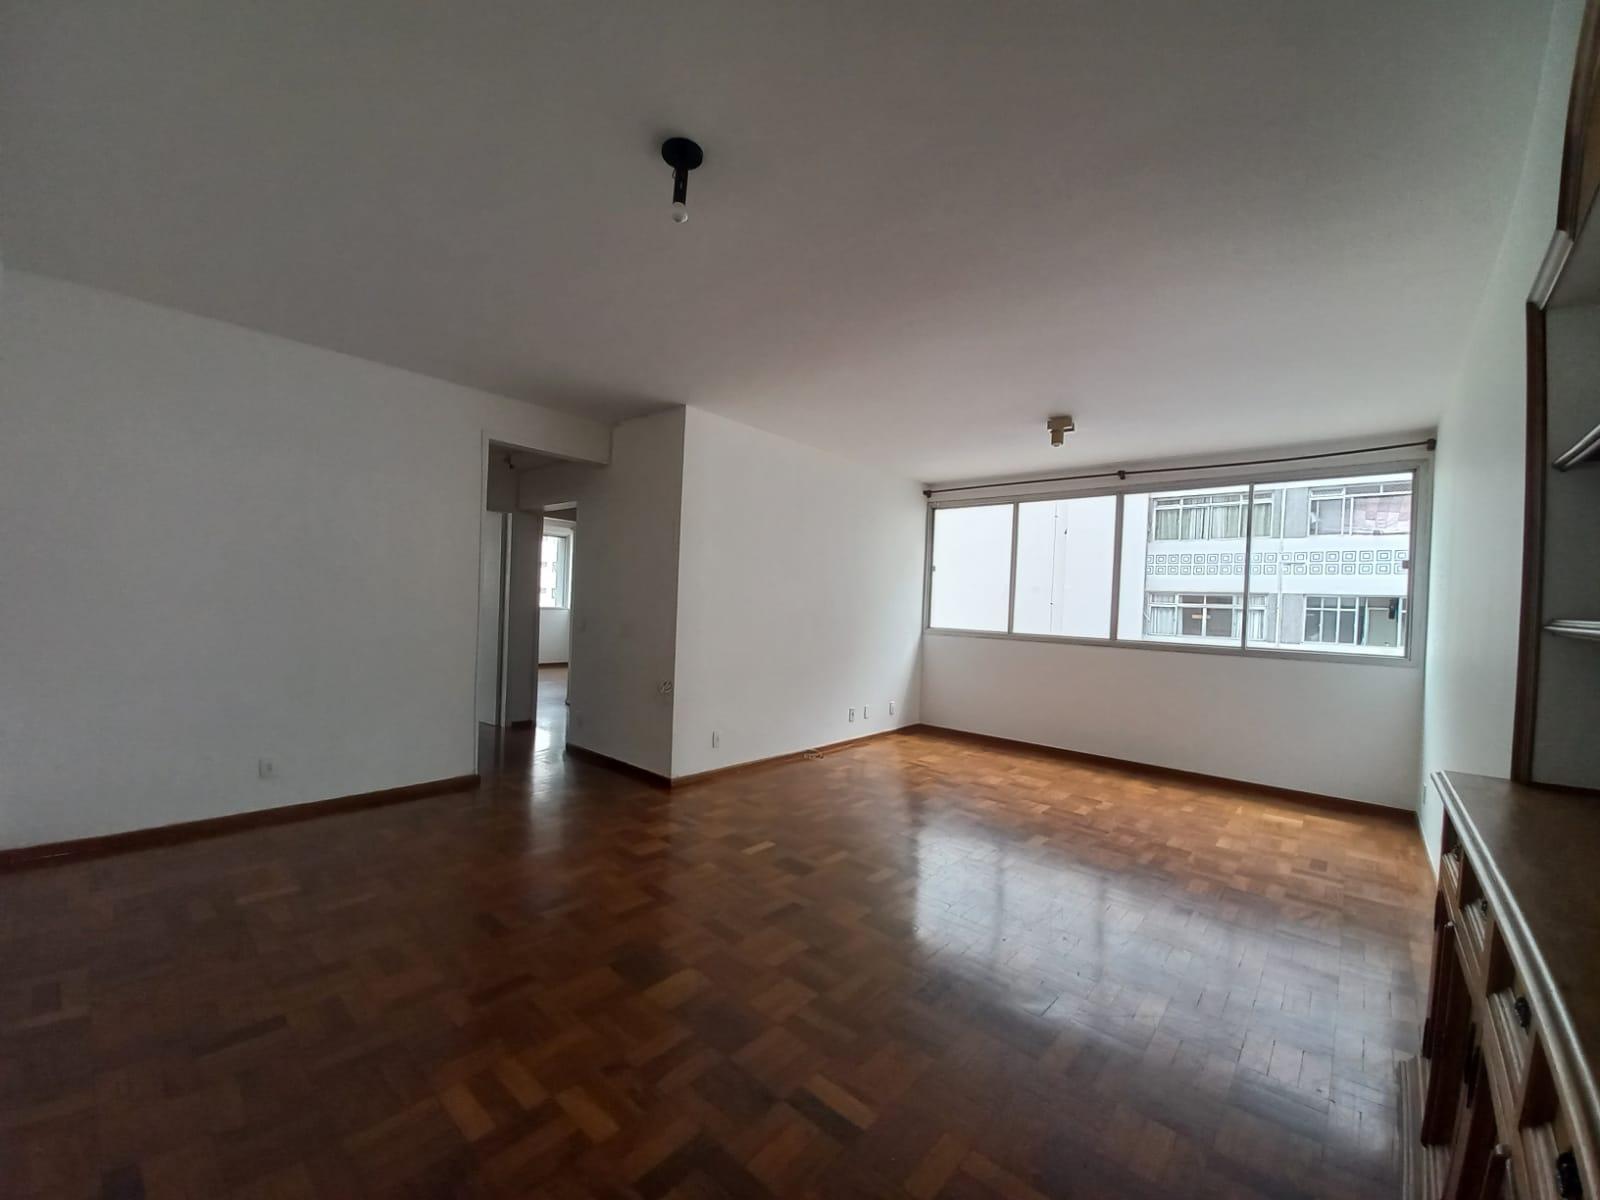 Apartamento para alugar, Paraíso, sao paulo